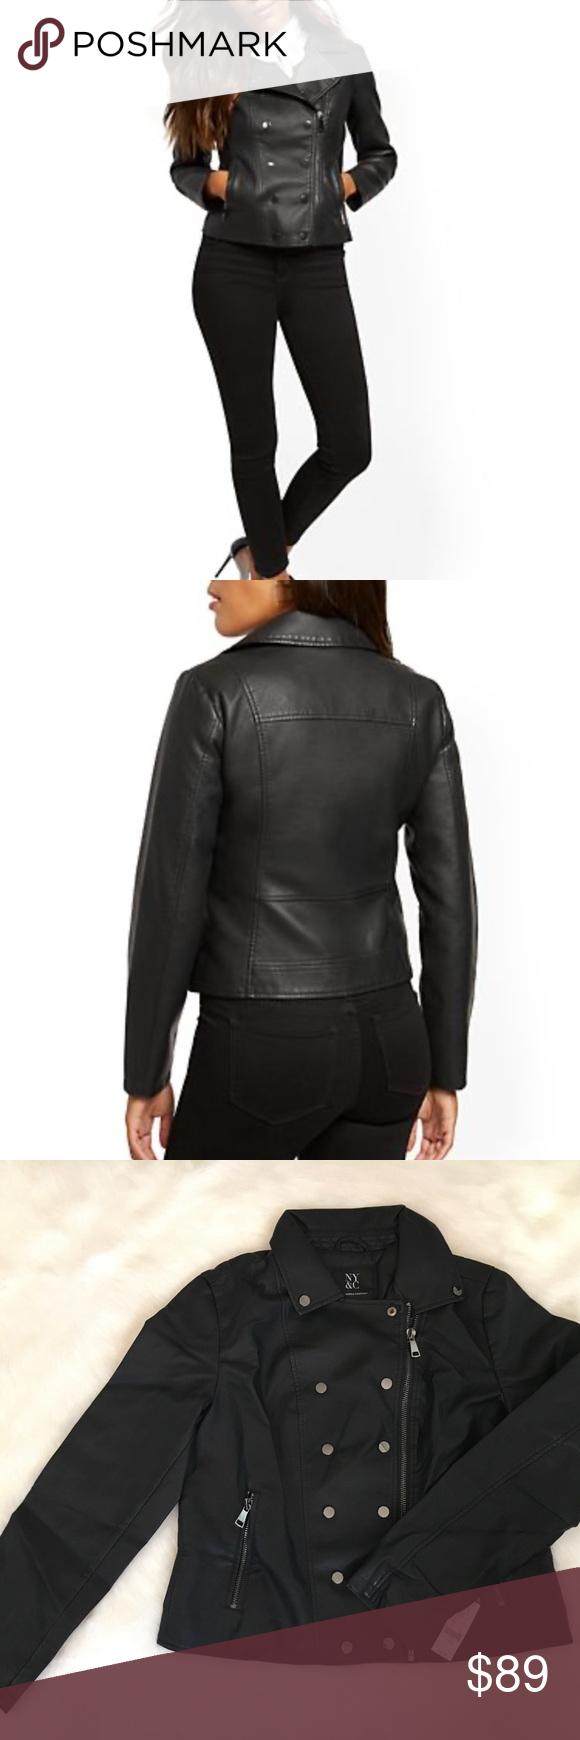 Host Pick🎉 Faux Leather Snap Moto Jacket Jackets, Moto